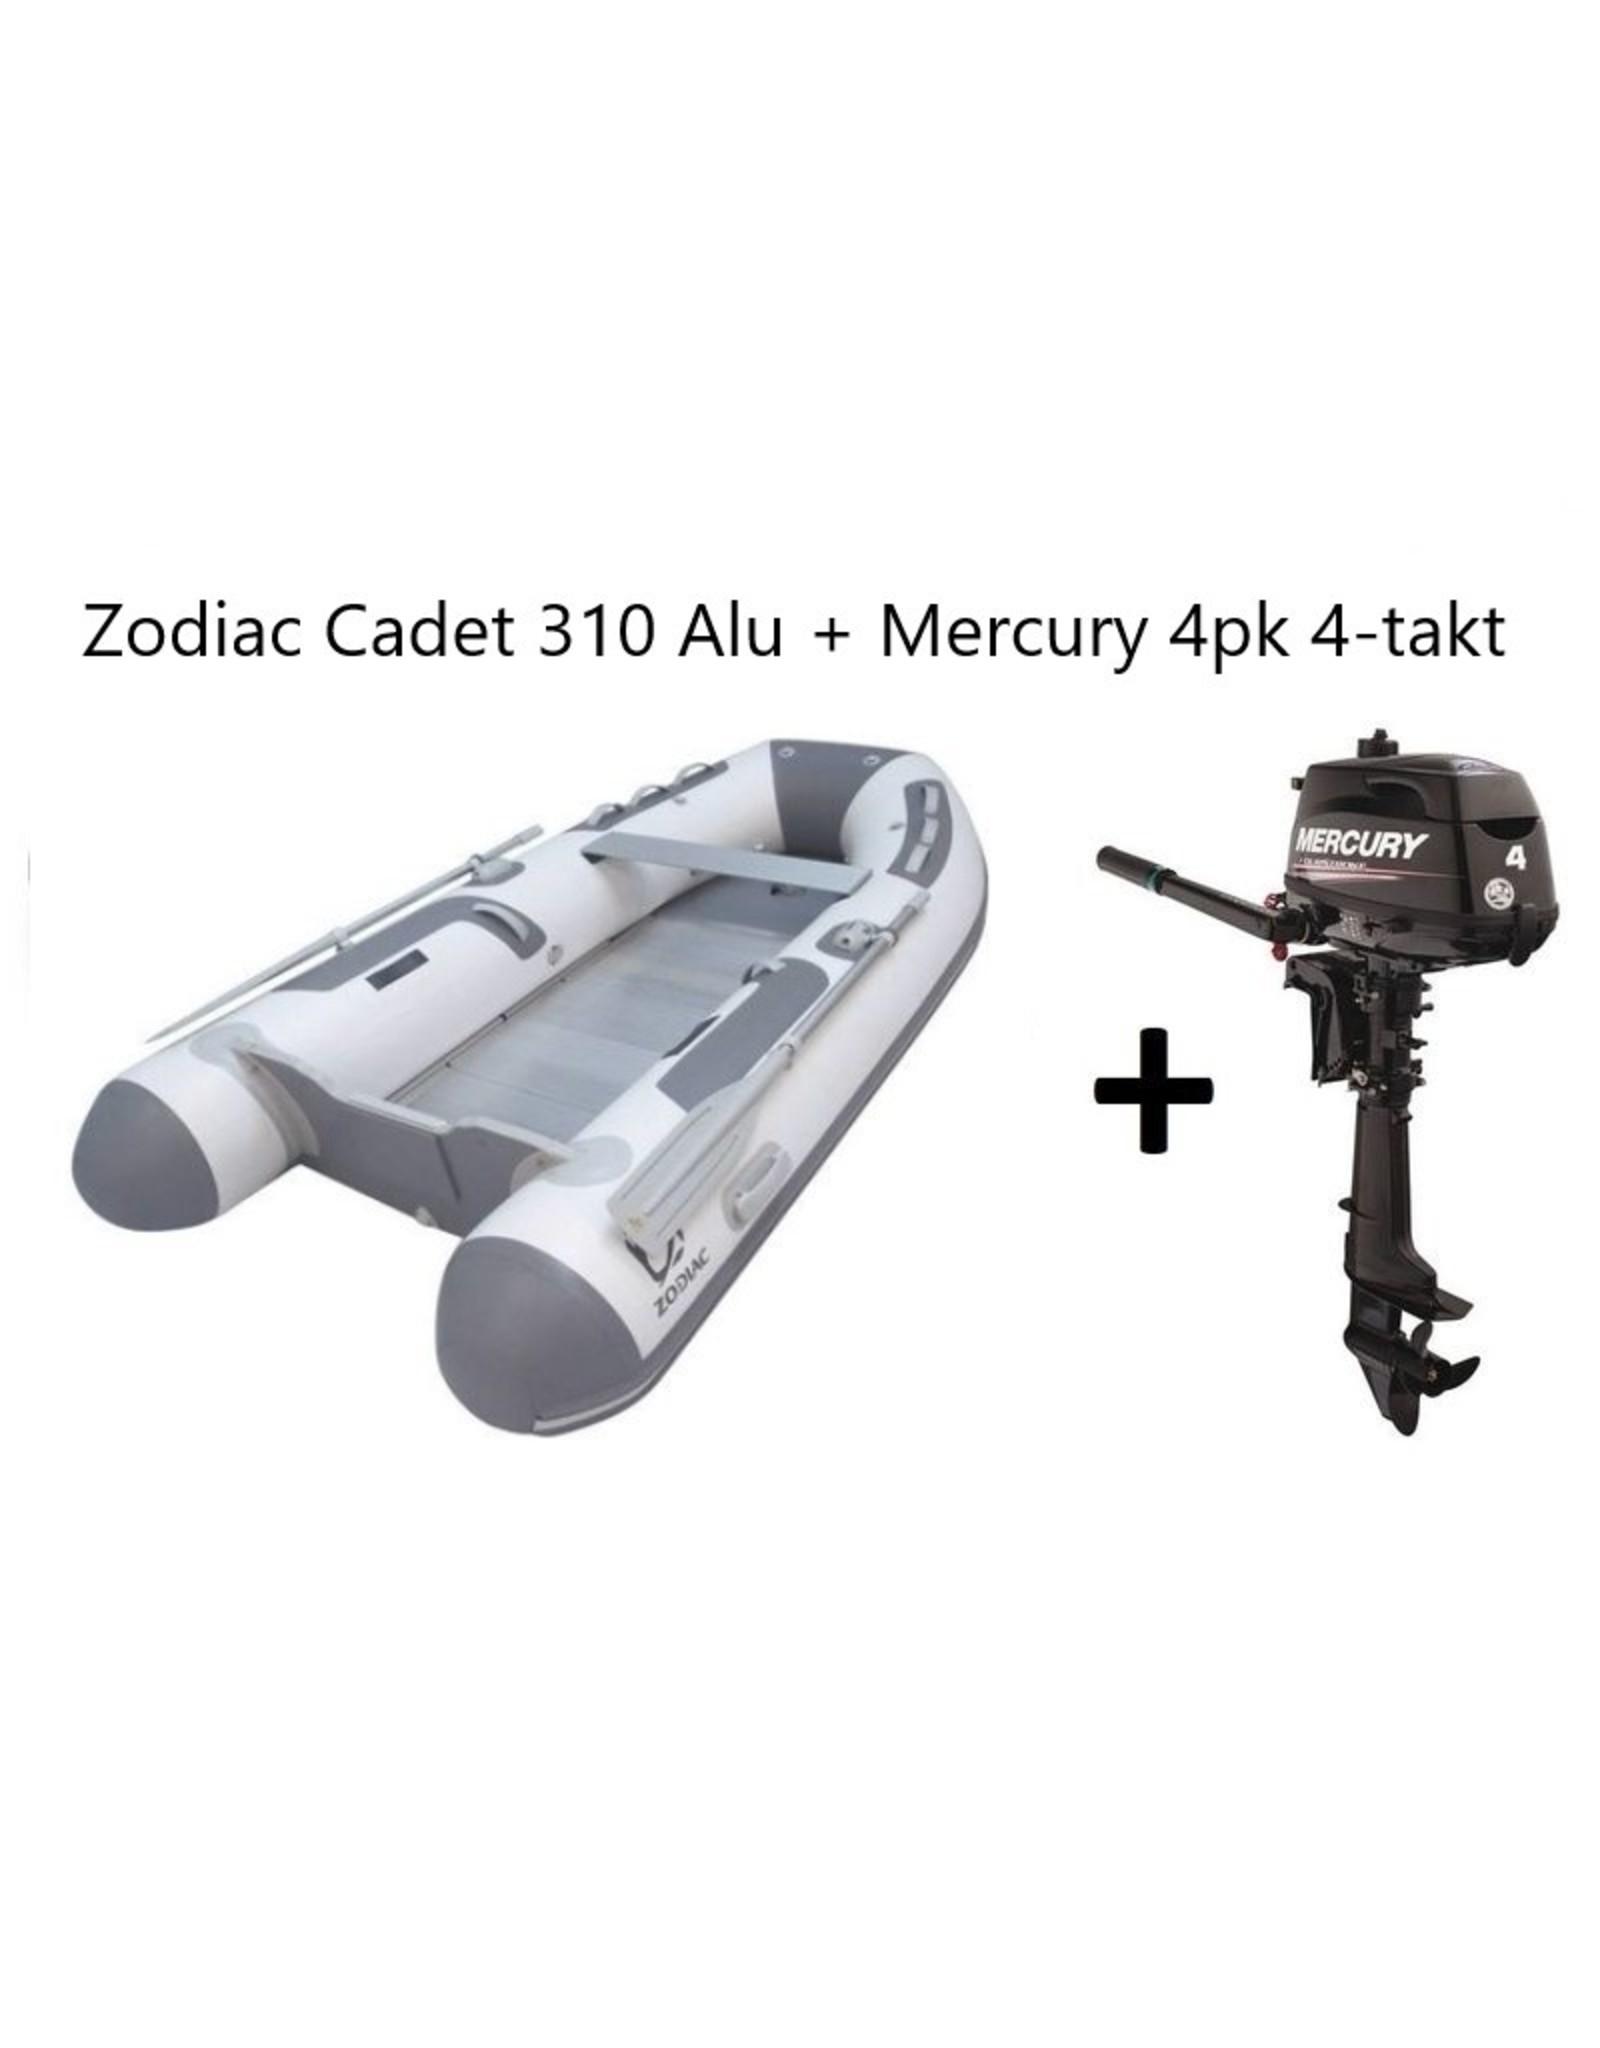 Zodiac Zodiac Cadet 310 Alu + Mercury 4pk 4-takt (Vaarbewijsvrij!)